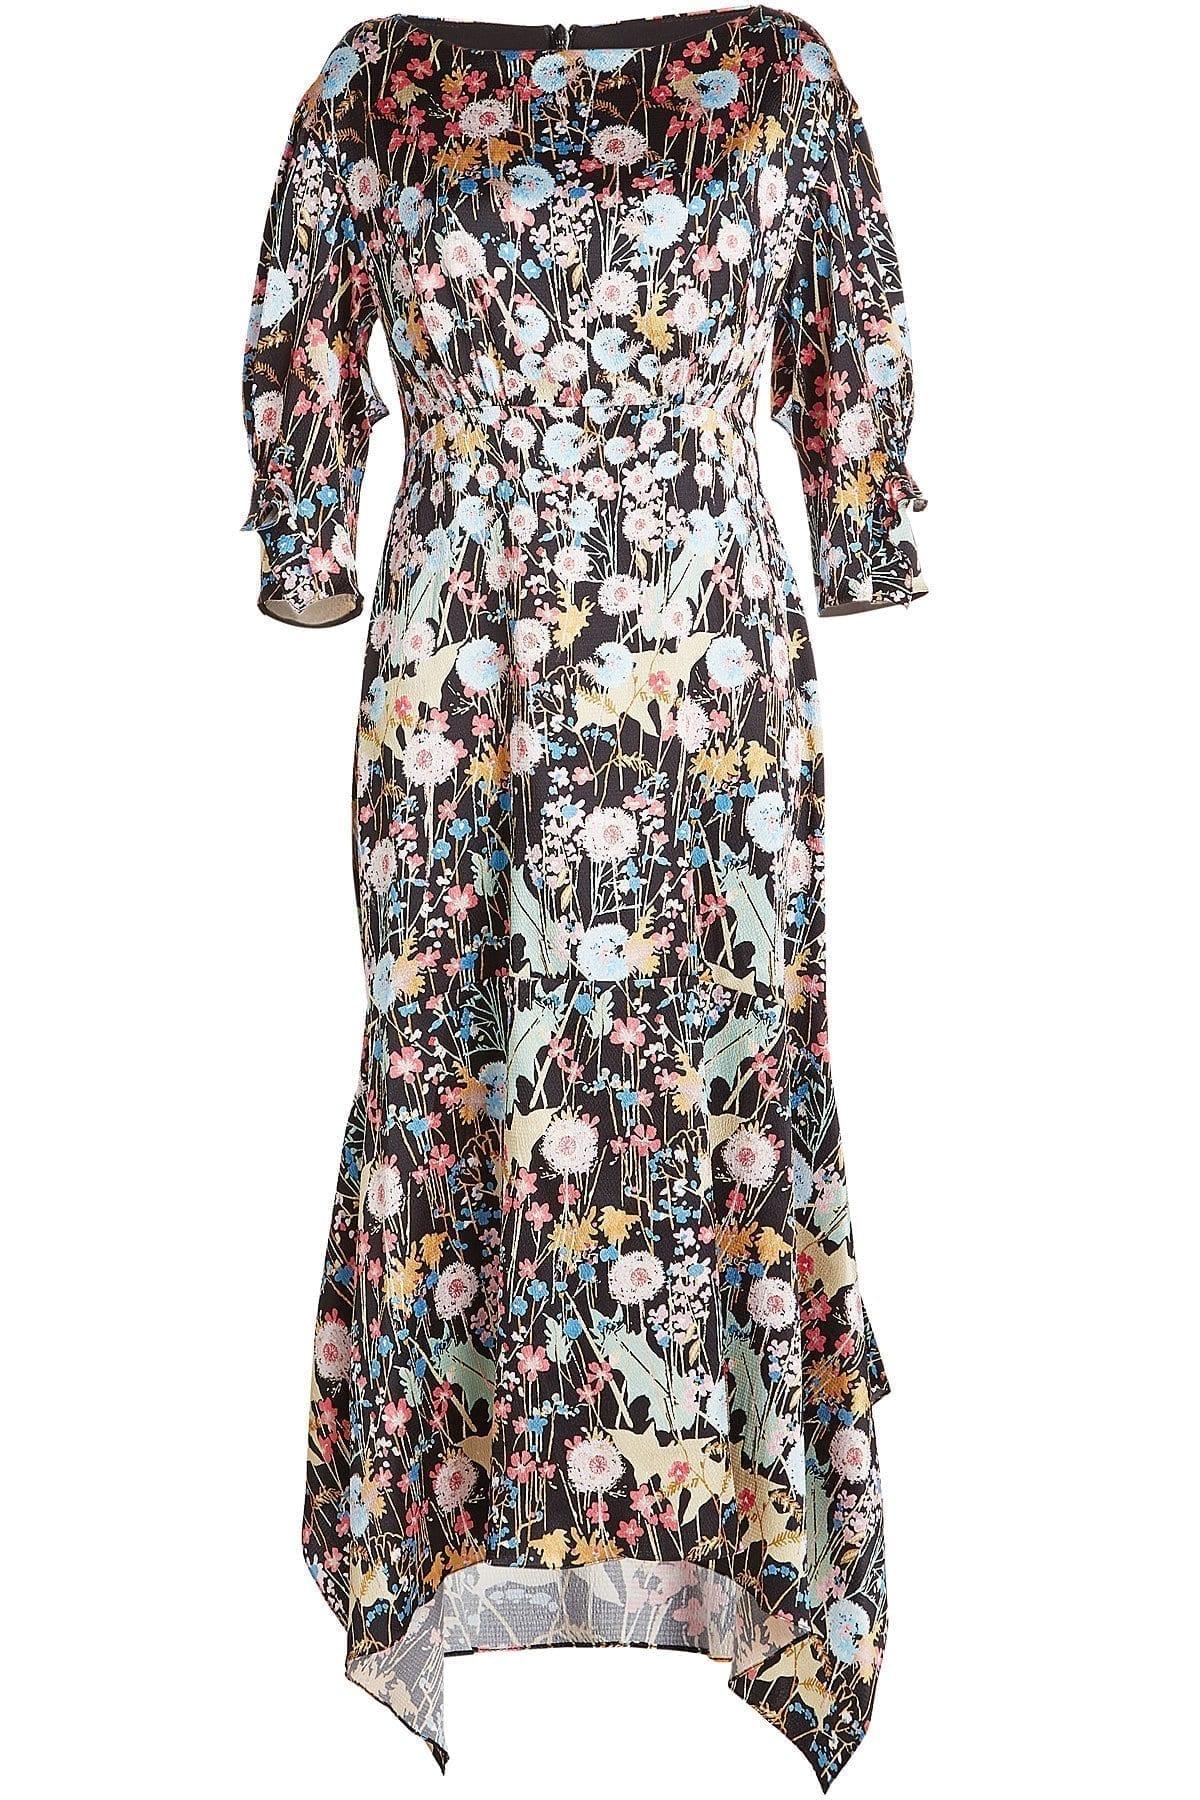 Peter pilotto silk floral printed multicolored dress we select dresses peter pilotto silk multi printed dress mightylinksfo